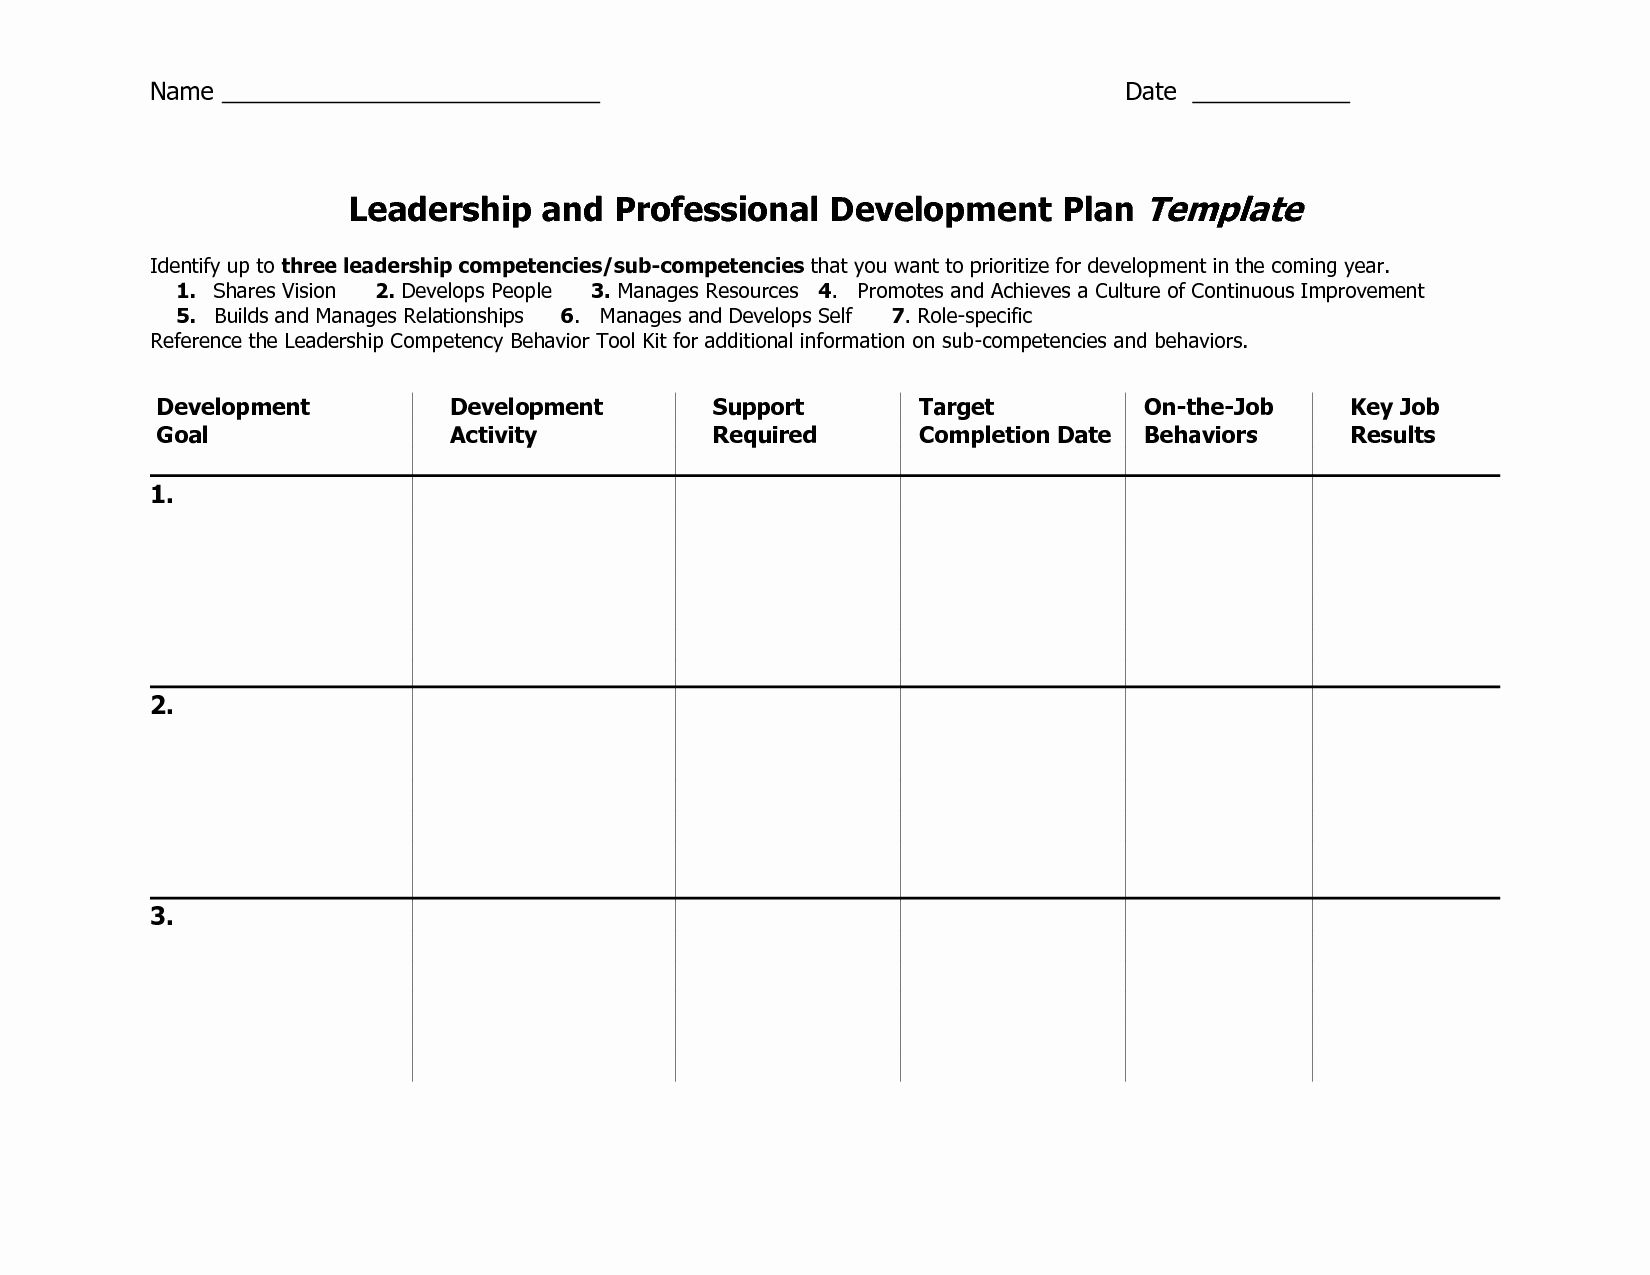 Business Succession Planning Template Luxury Individual Development Professional Development Plan Personal Development Plan Template Personal Development Plan